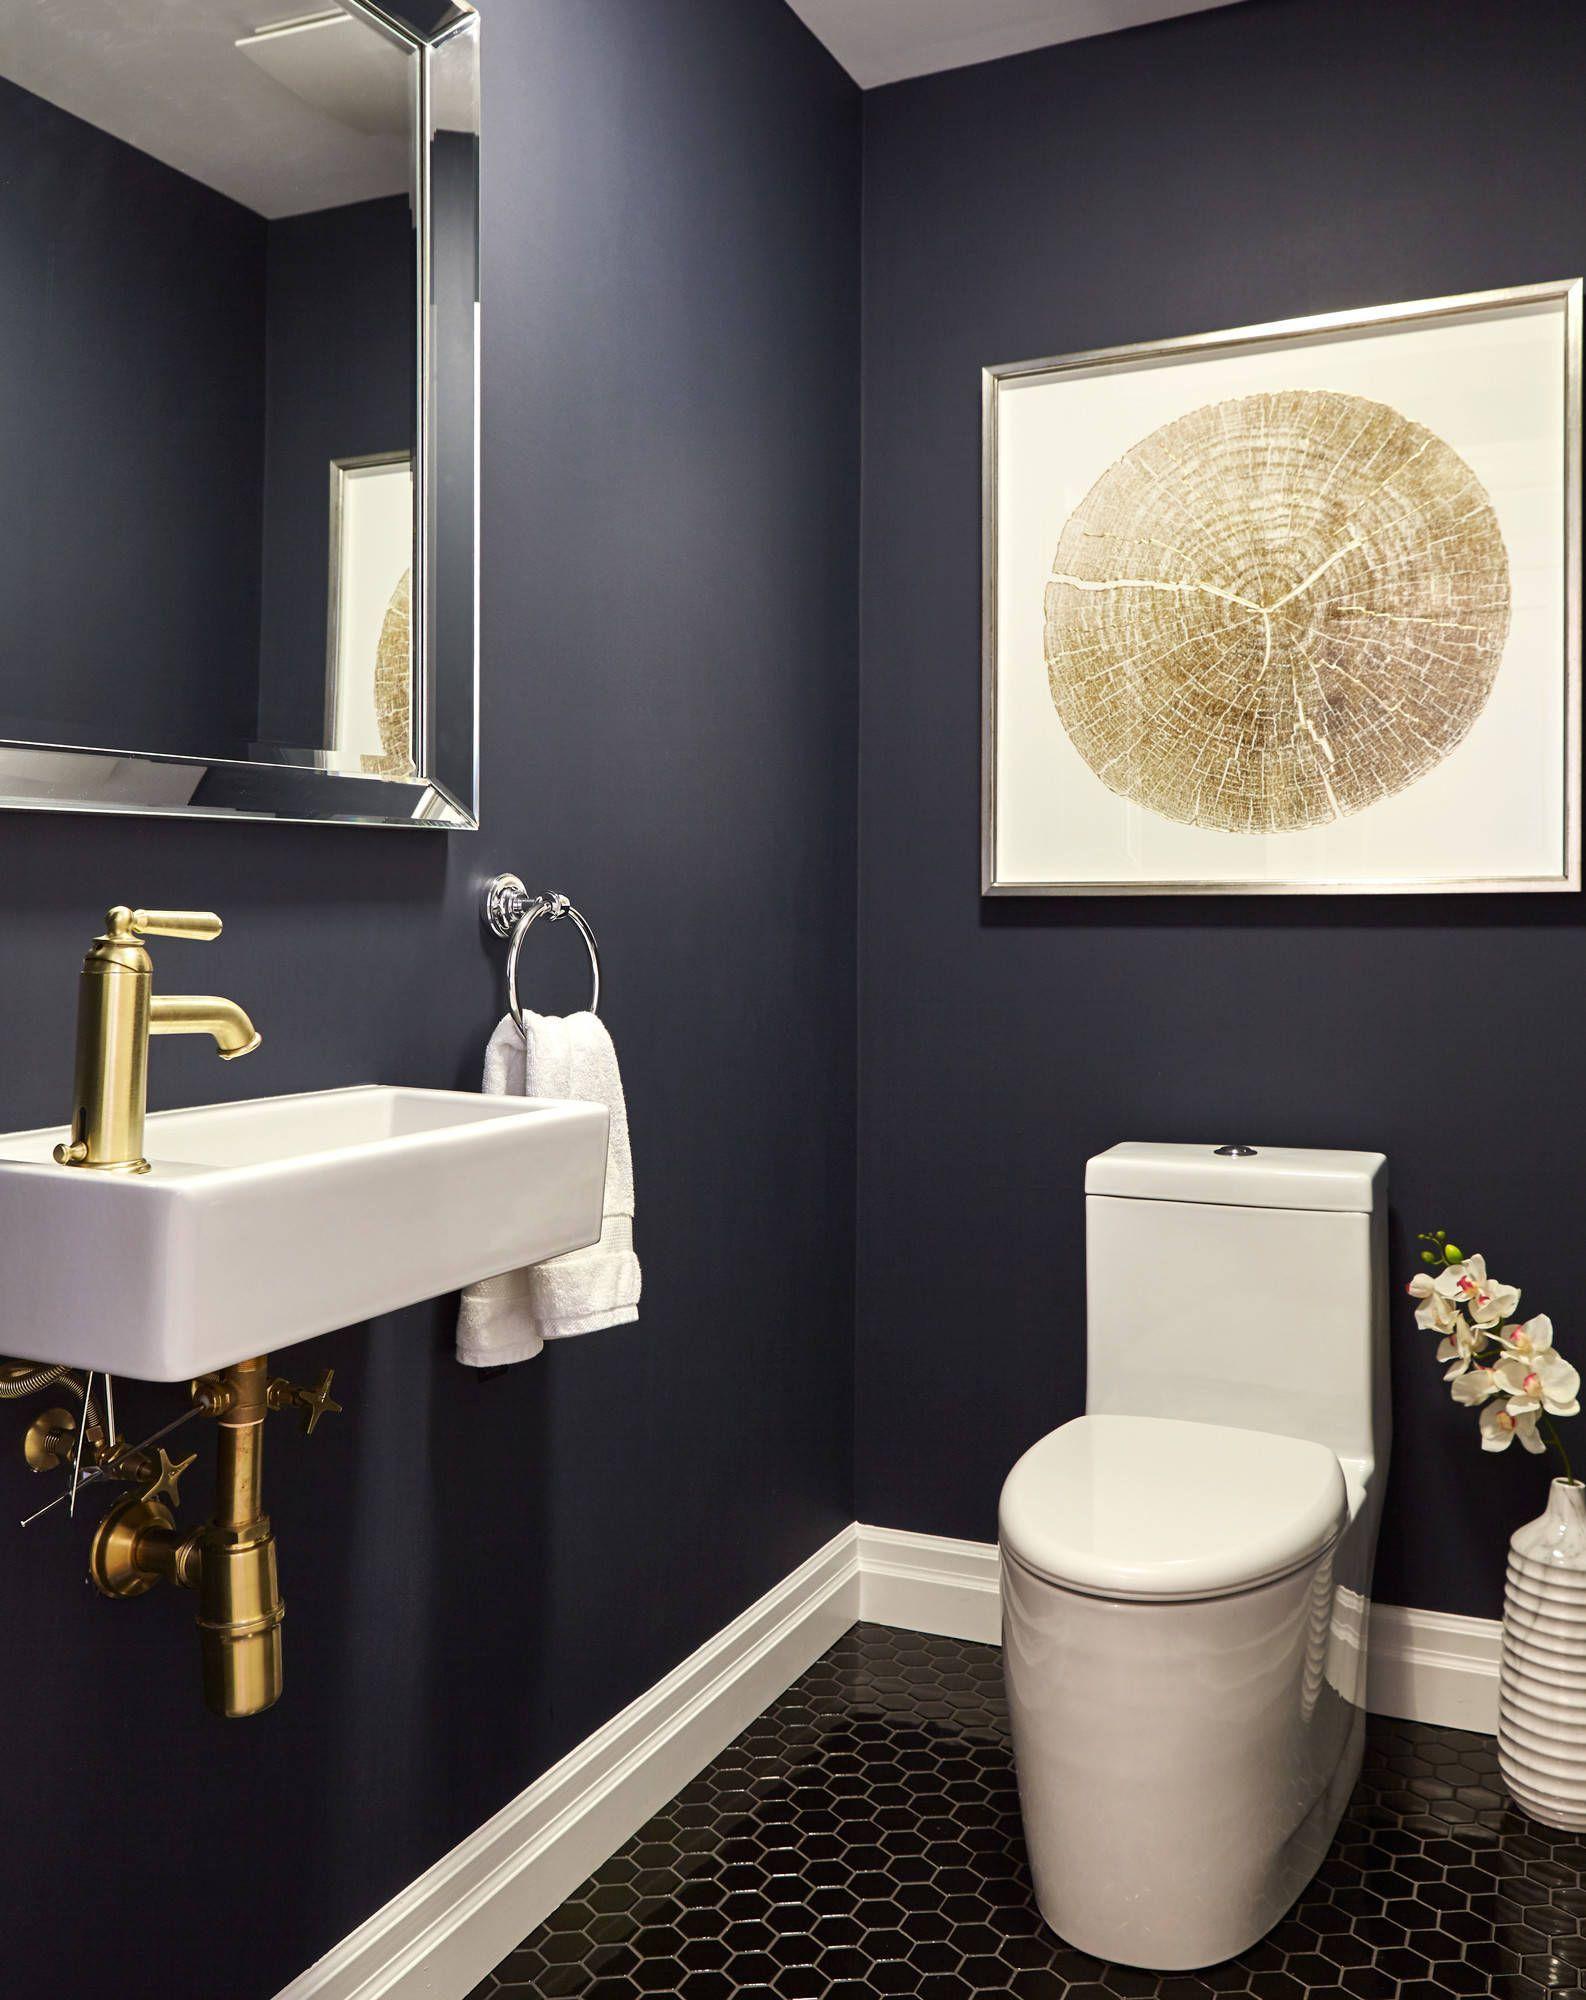 42 Small Bathroom Designs And Ideas Bathroom Design Small